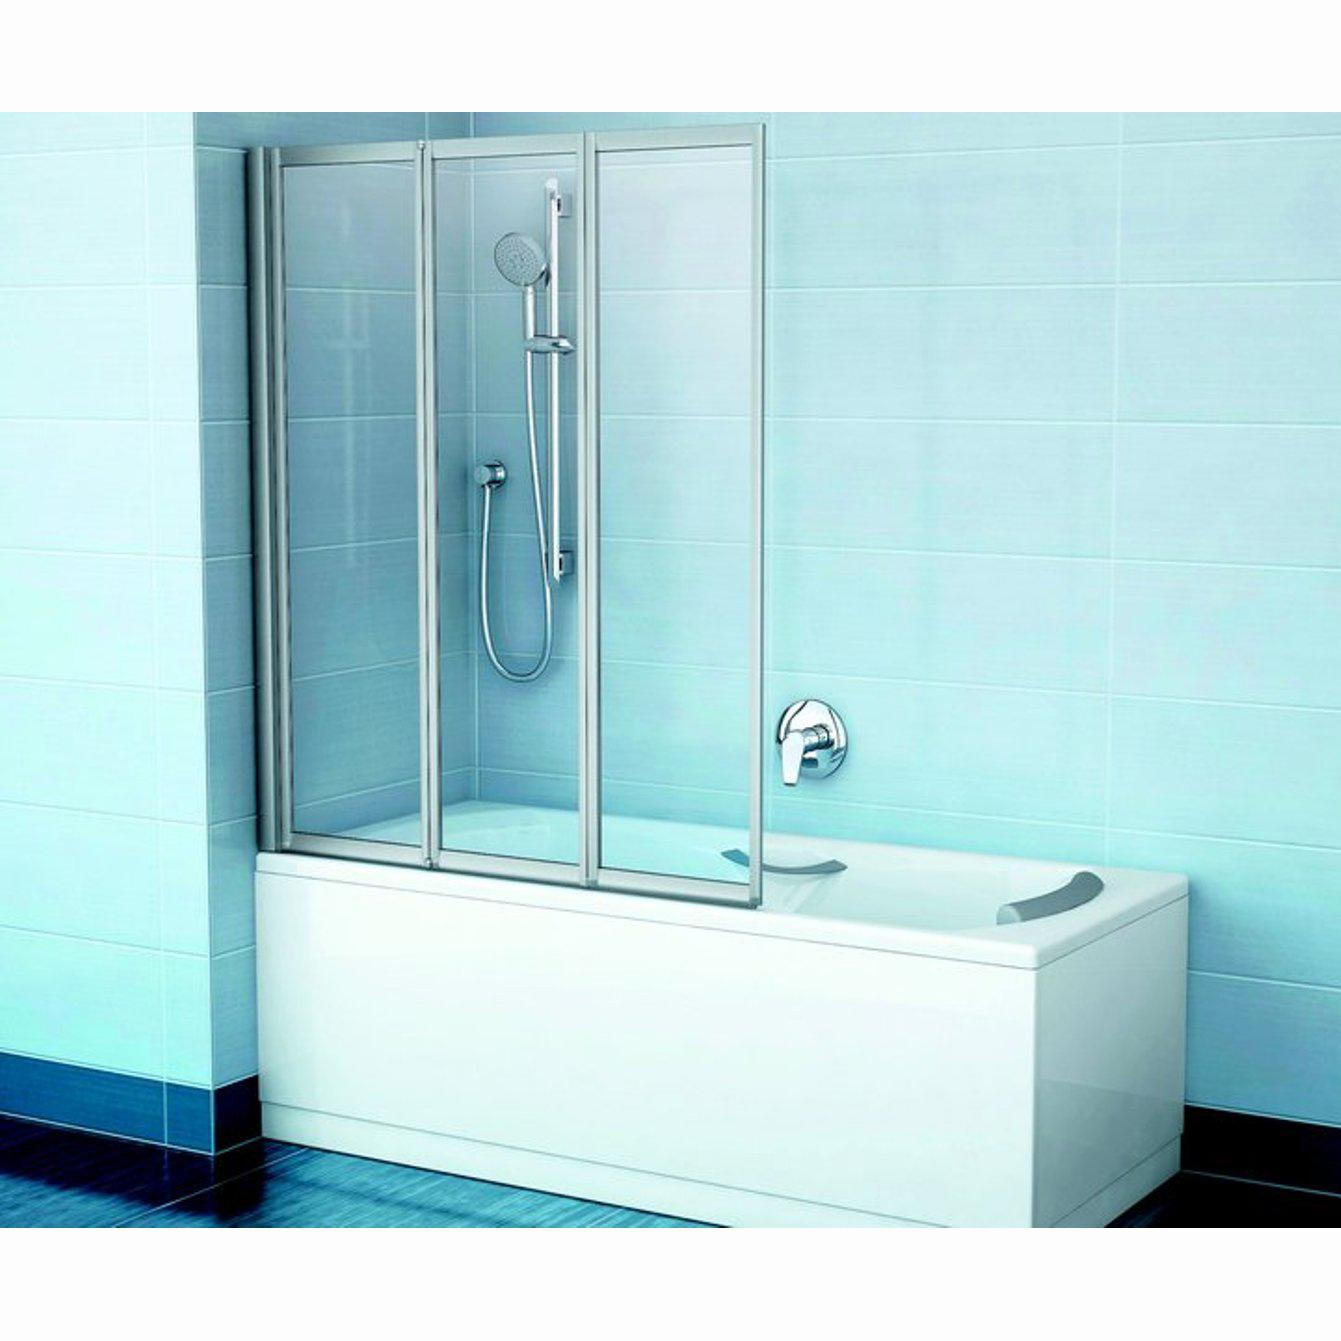 Шторка для ванны Ravak VS3 115 белый профиль, прозрачное стекло шторка на ванну ravak vs3 115 115х140 см рейн 795s010041